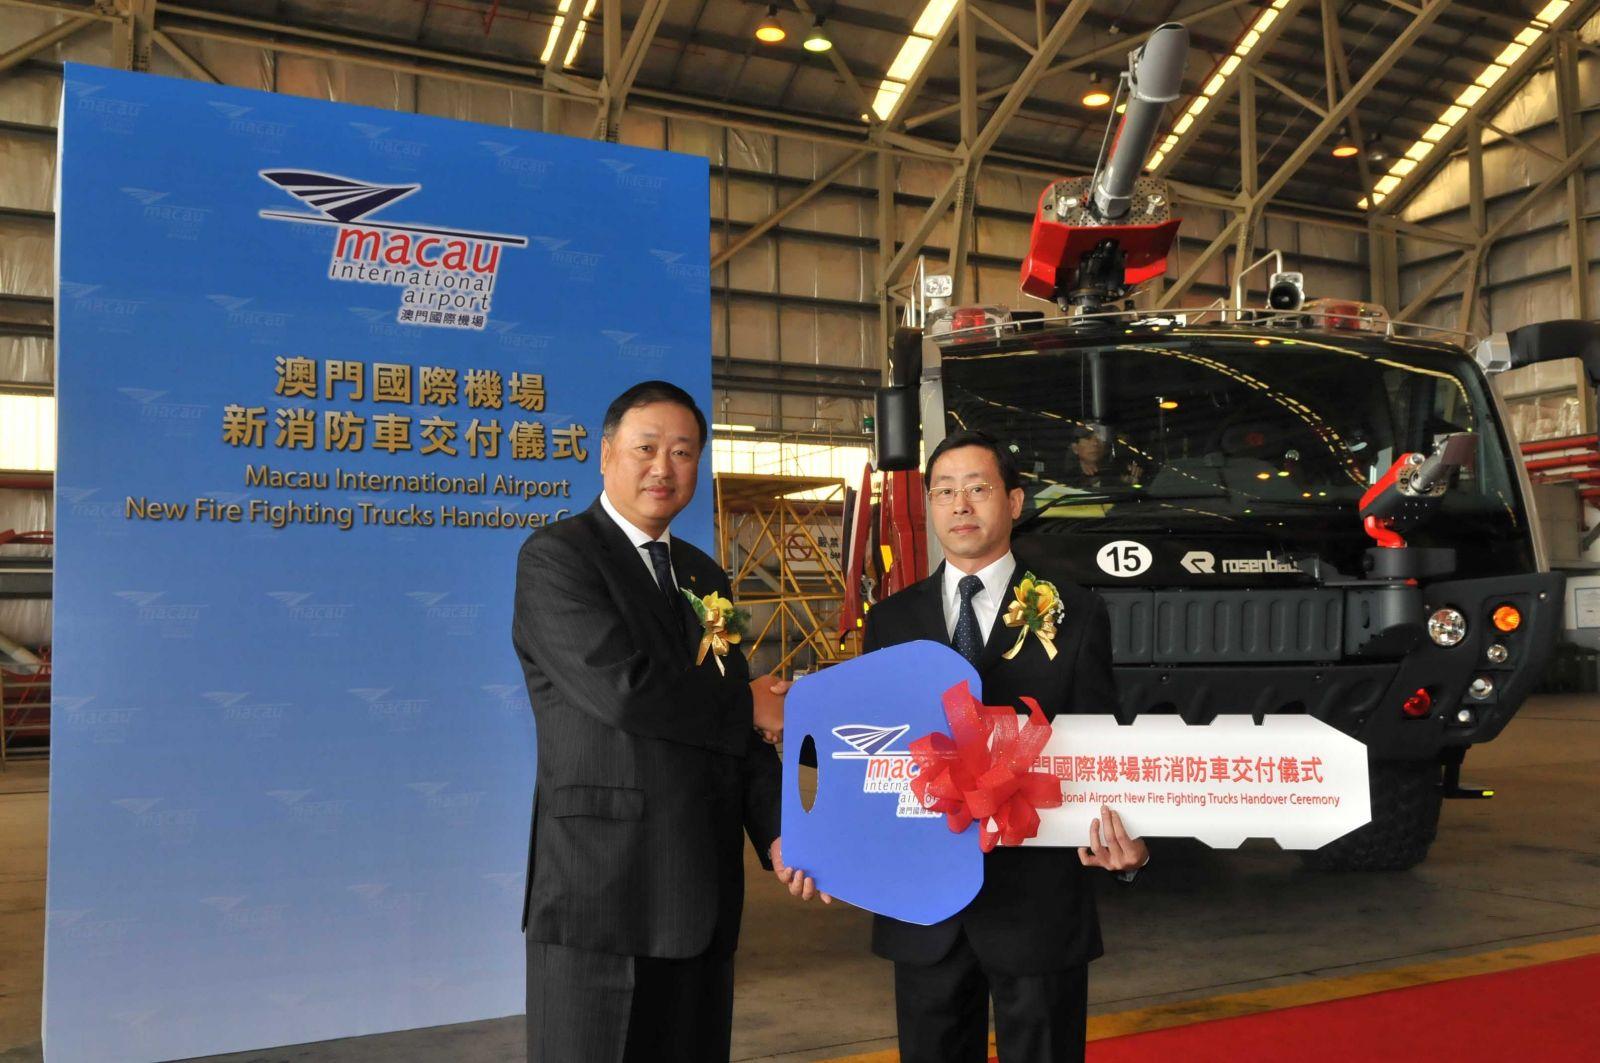 New Fire Fighting Trucks Handover Ceremony of Macau